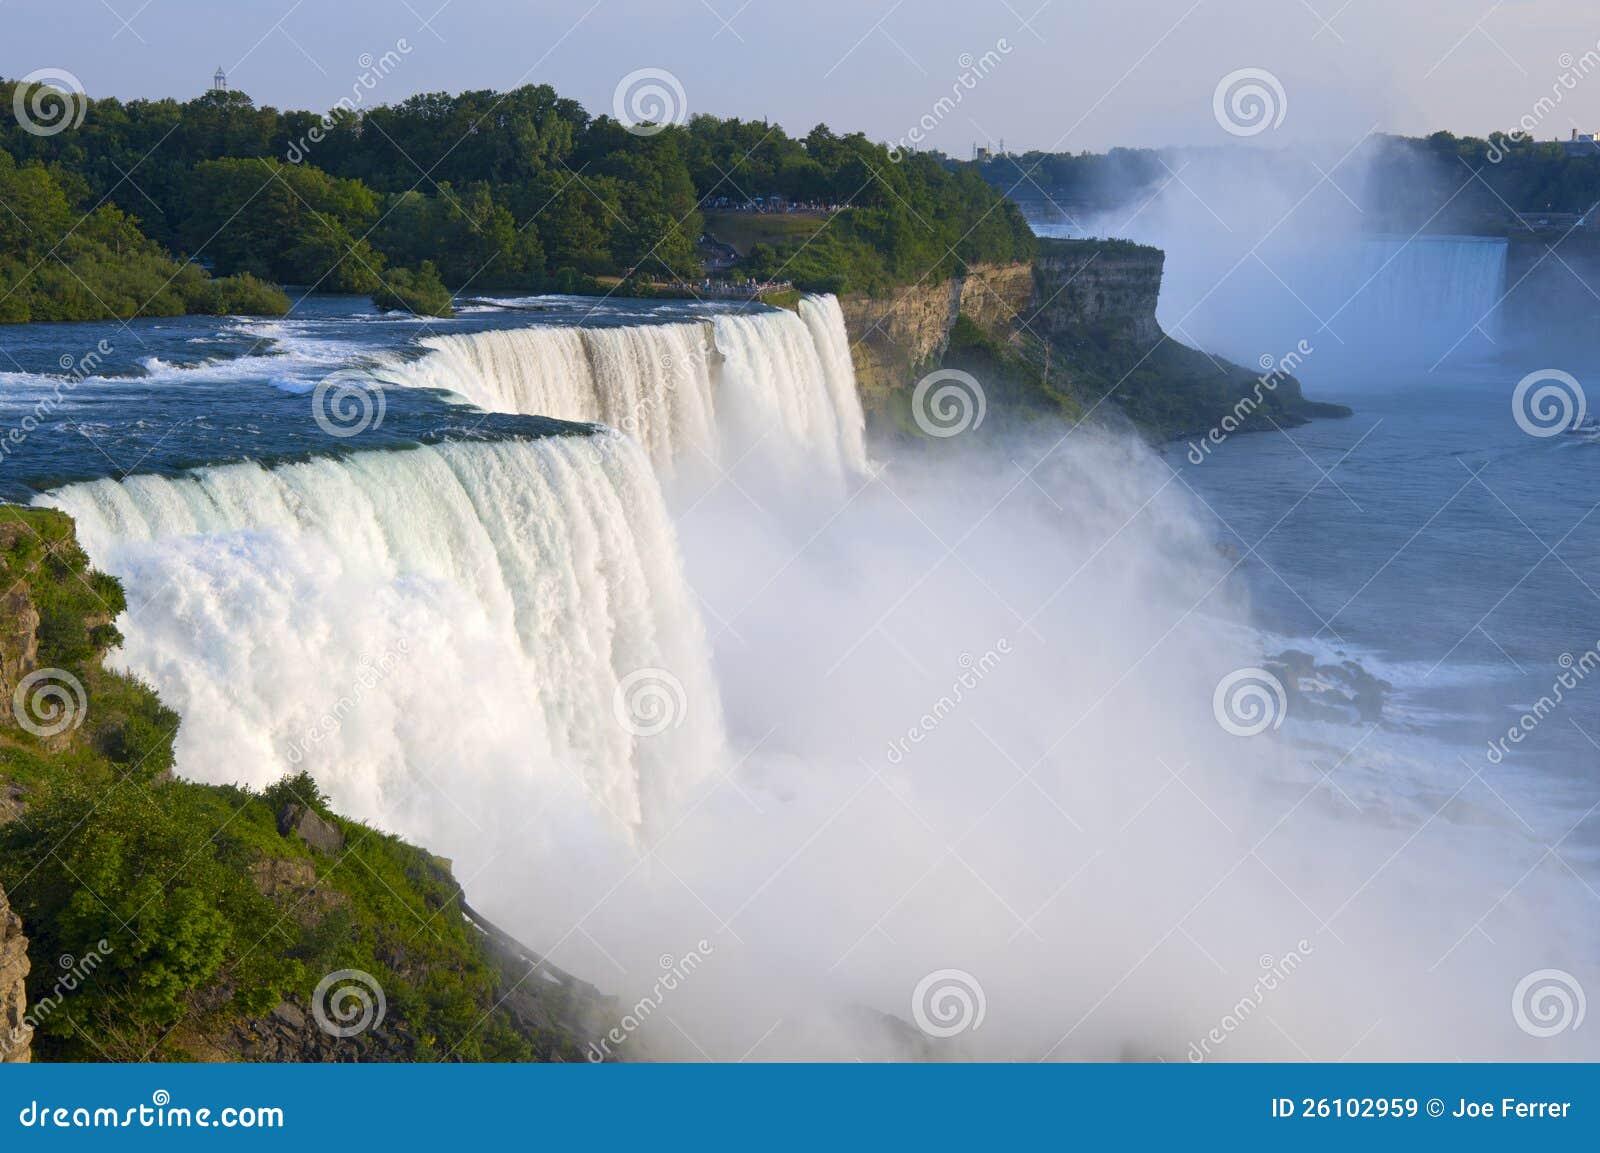 American Falls Overlook at Niagara